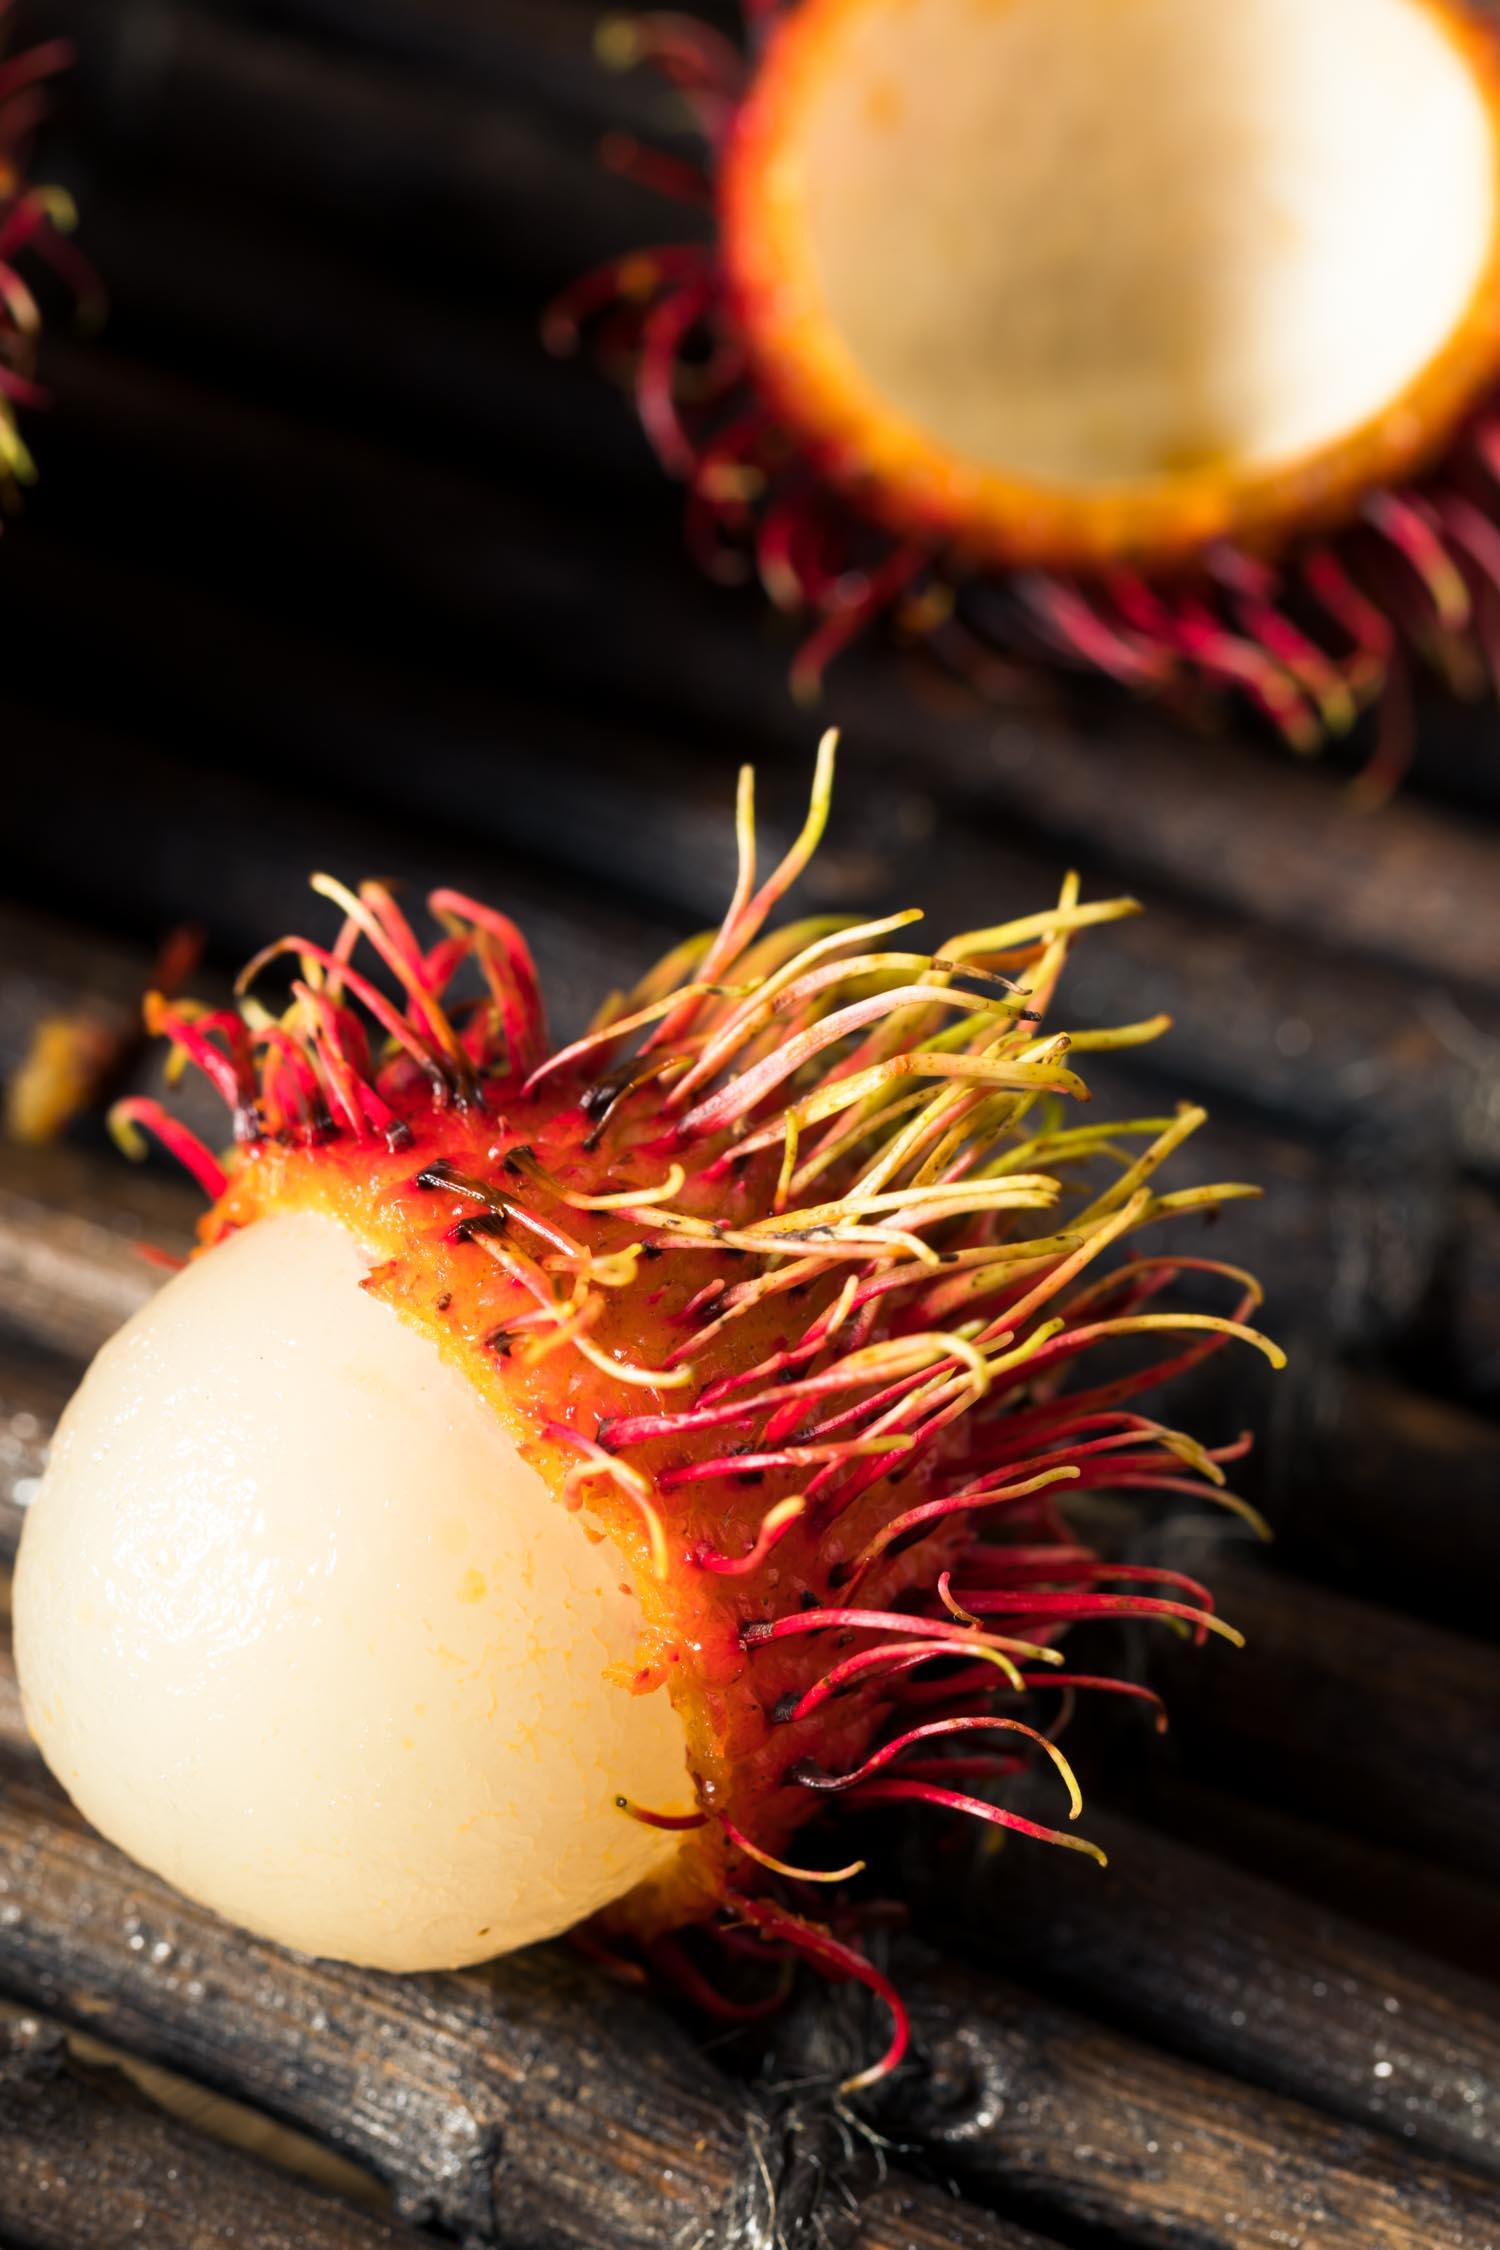 Fruit in Hawaii Raw Red Organic Rambutan Fruit Ready to Eat